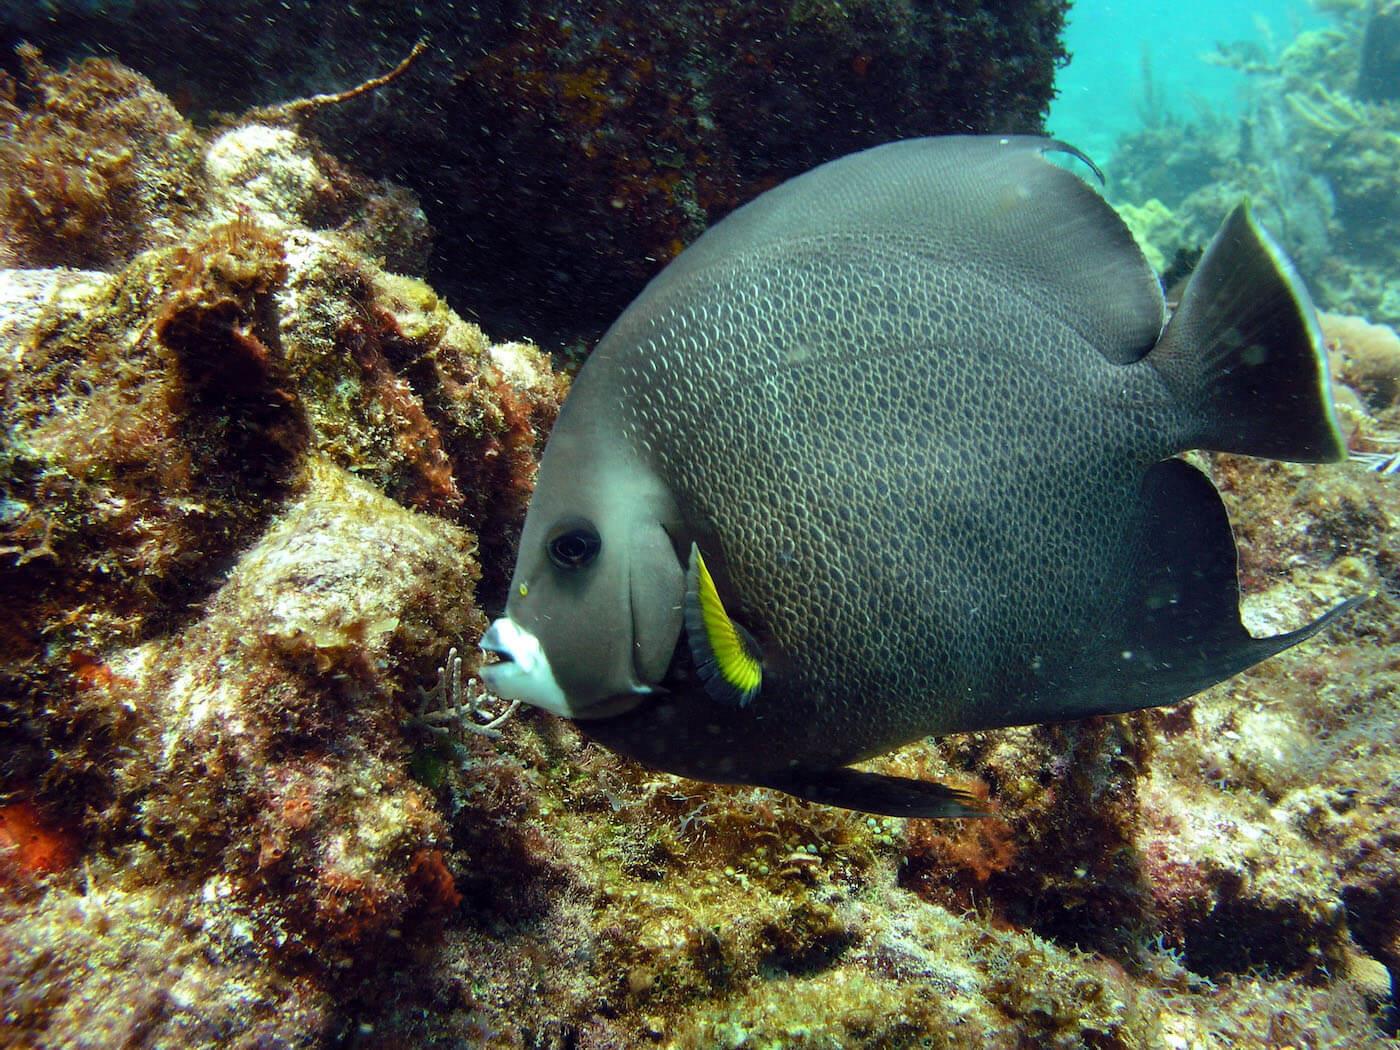 Isla Mujeres Scuba Diving Snorkeling Manchones Reef Squalo Adventures-1